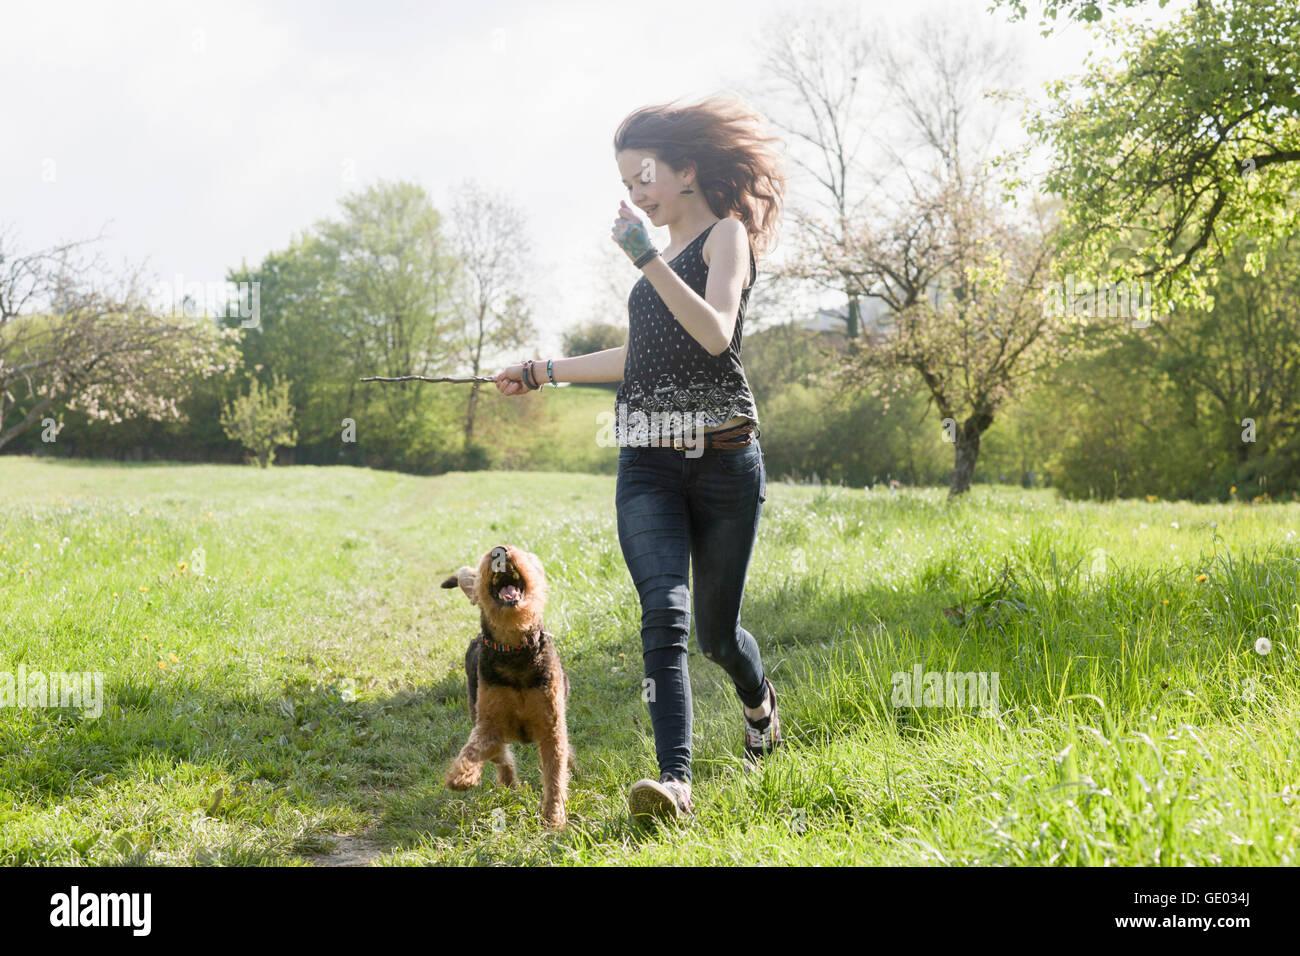 Teenage girl running in park with her dog, Freiburg im Breisgau, Baden-Württemberg, Germany - Stock Image